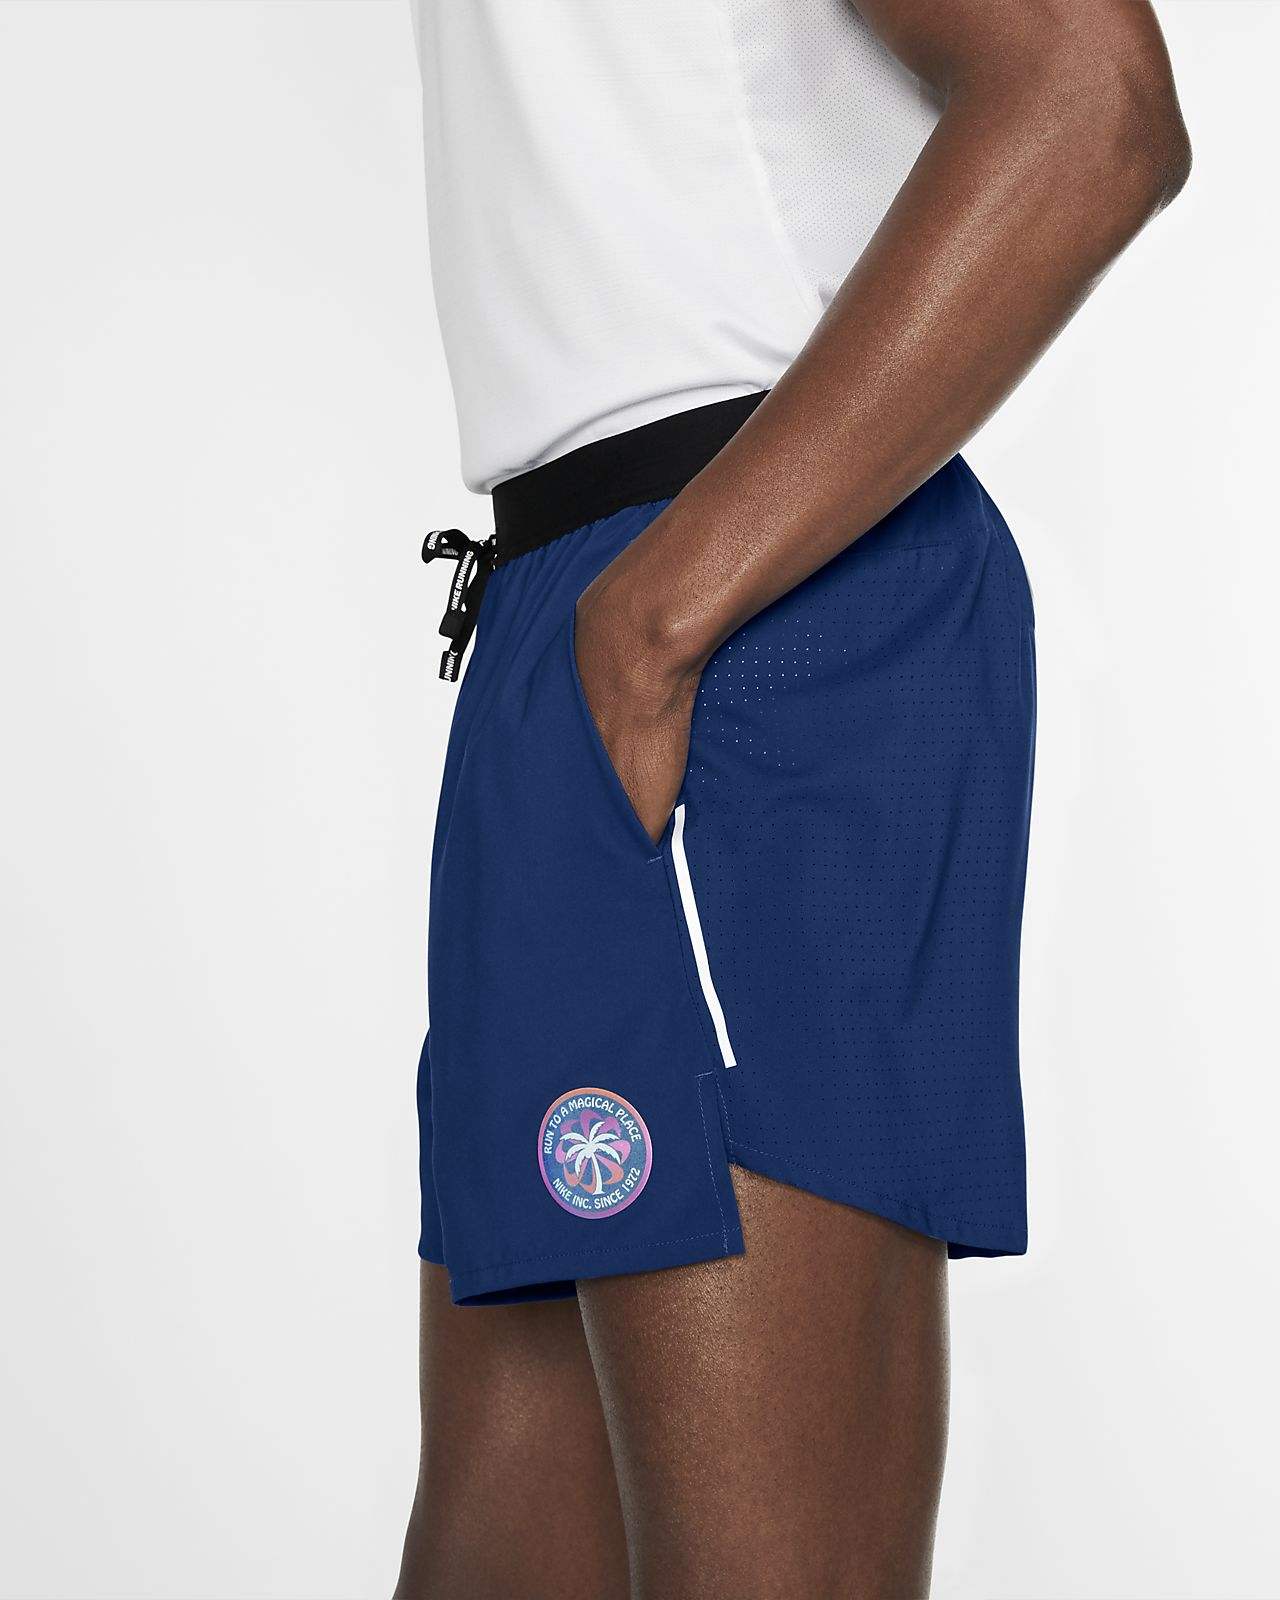 e1204e92442f Lined Running Shorts Nike Flex Stride 5